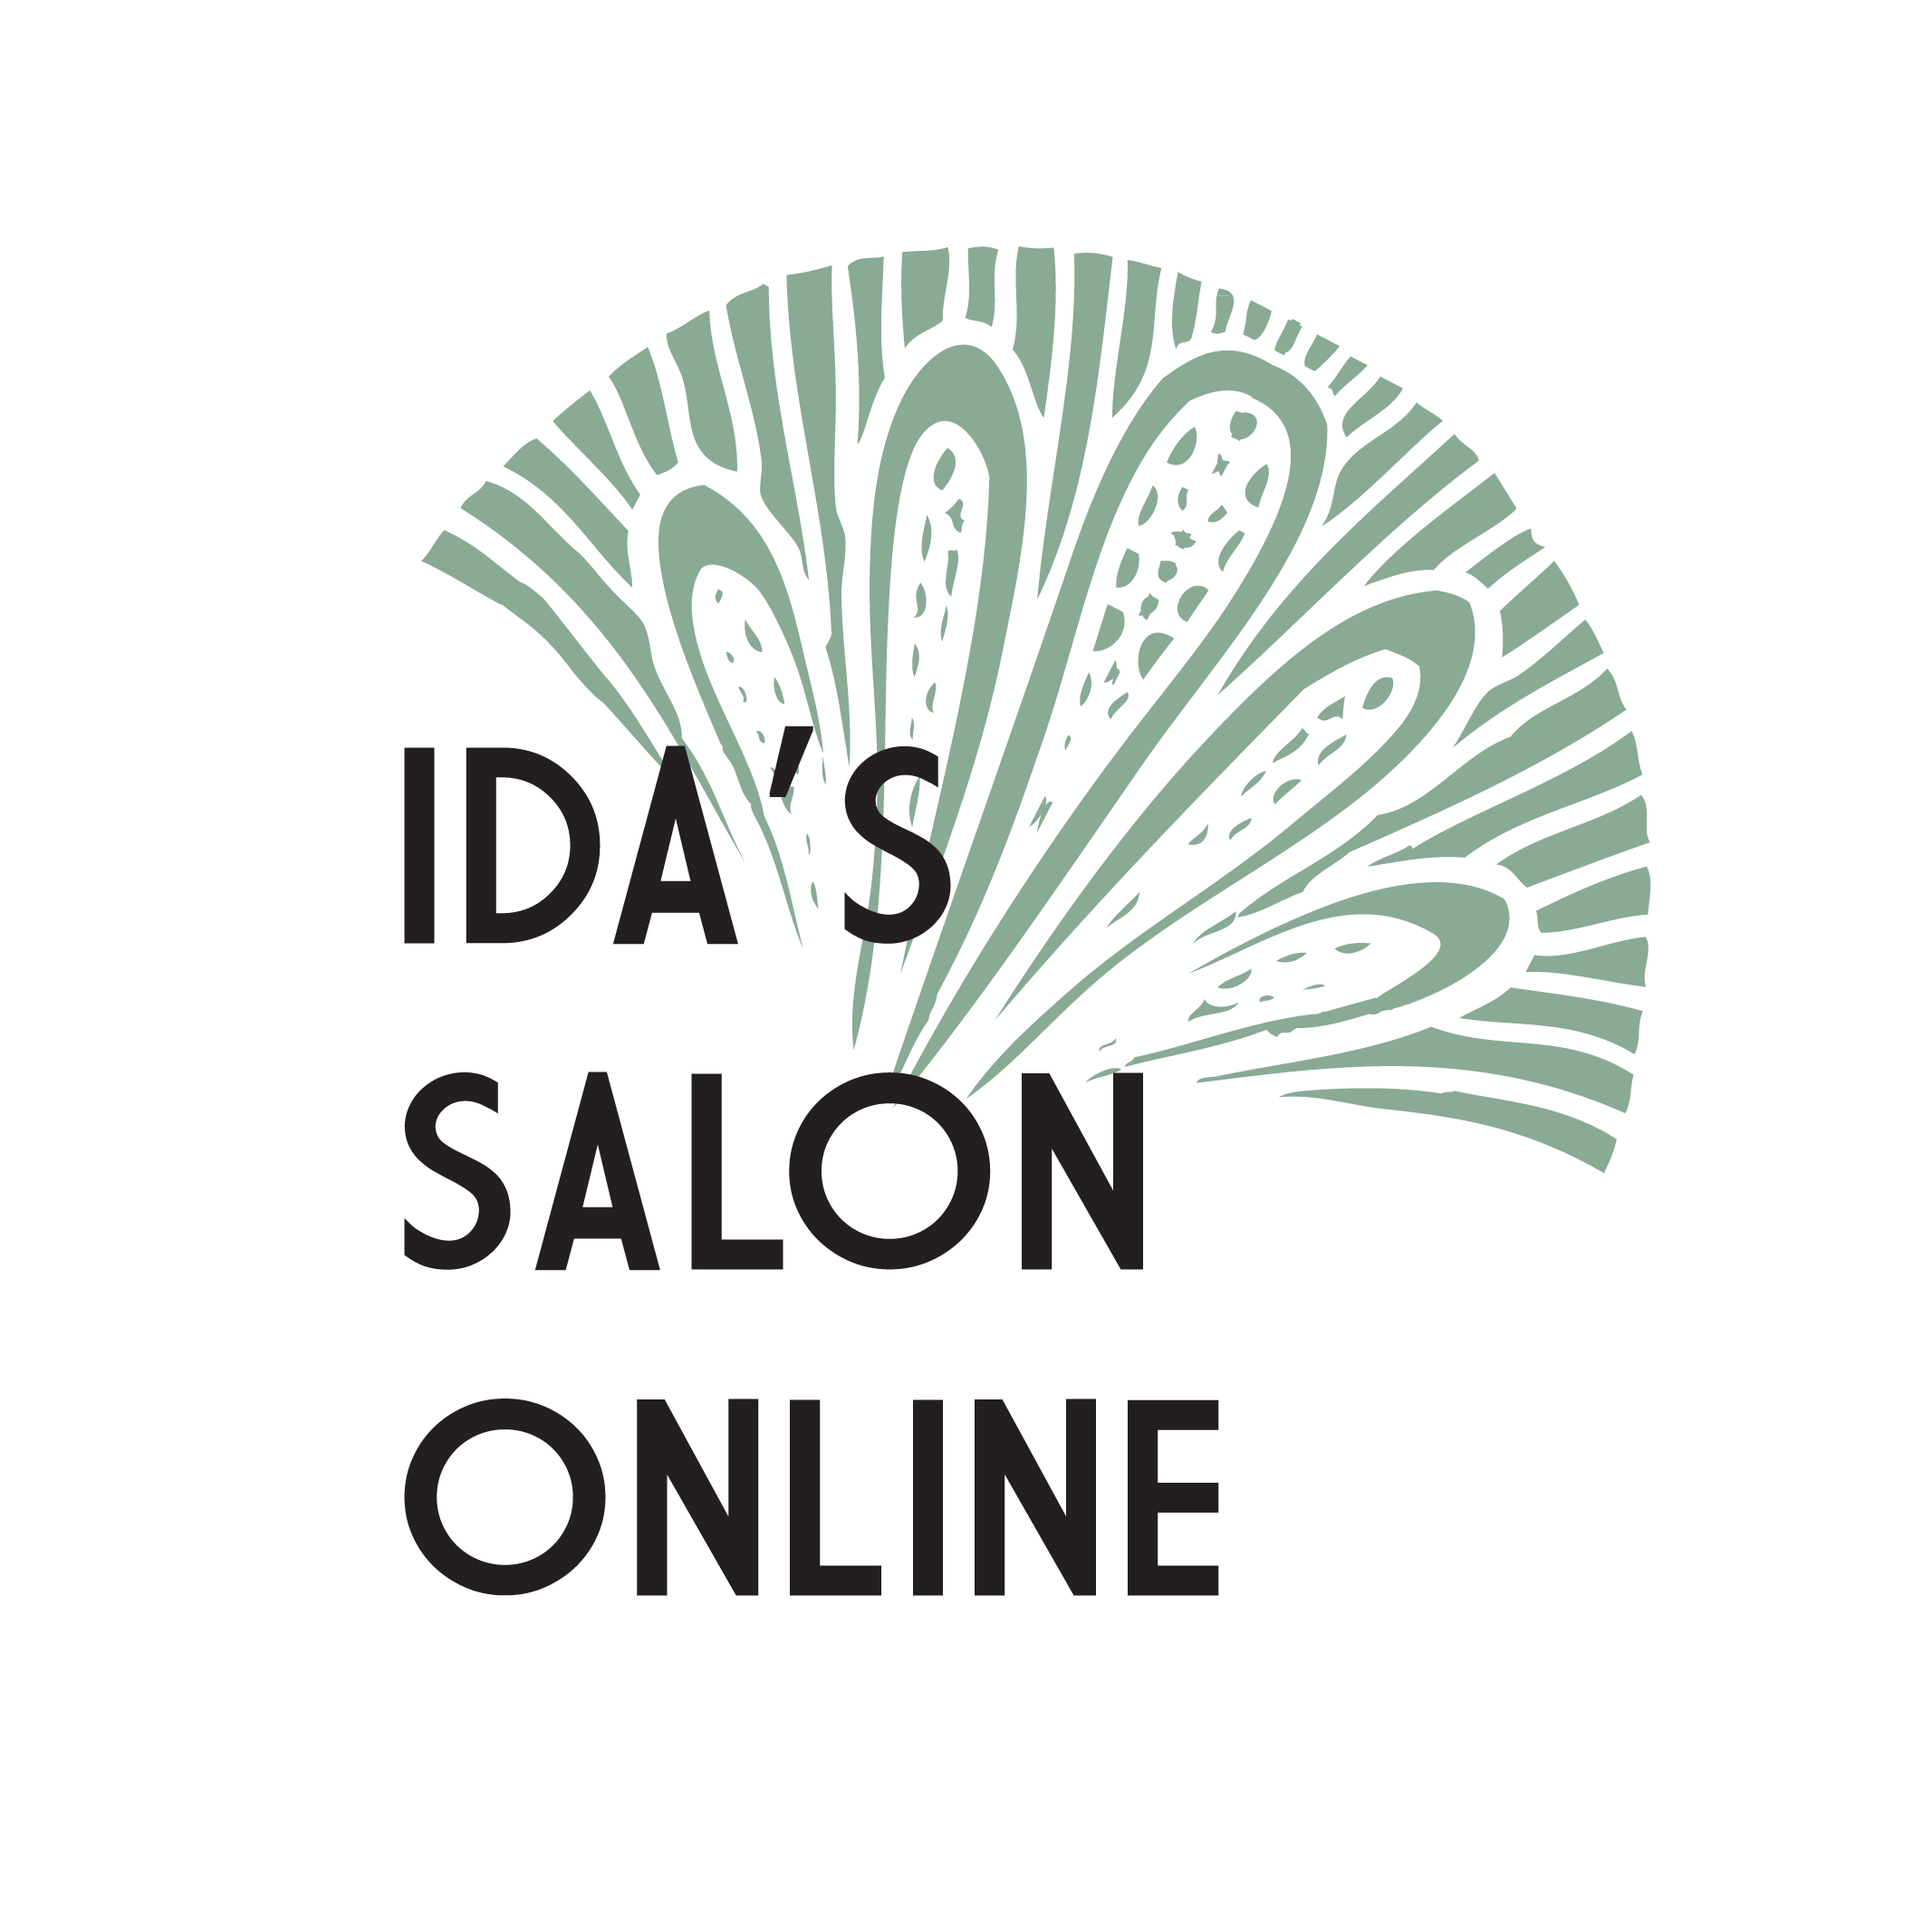 Ida's Salon Online